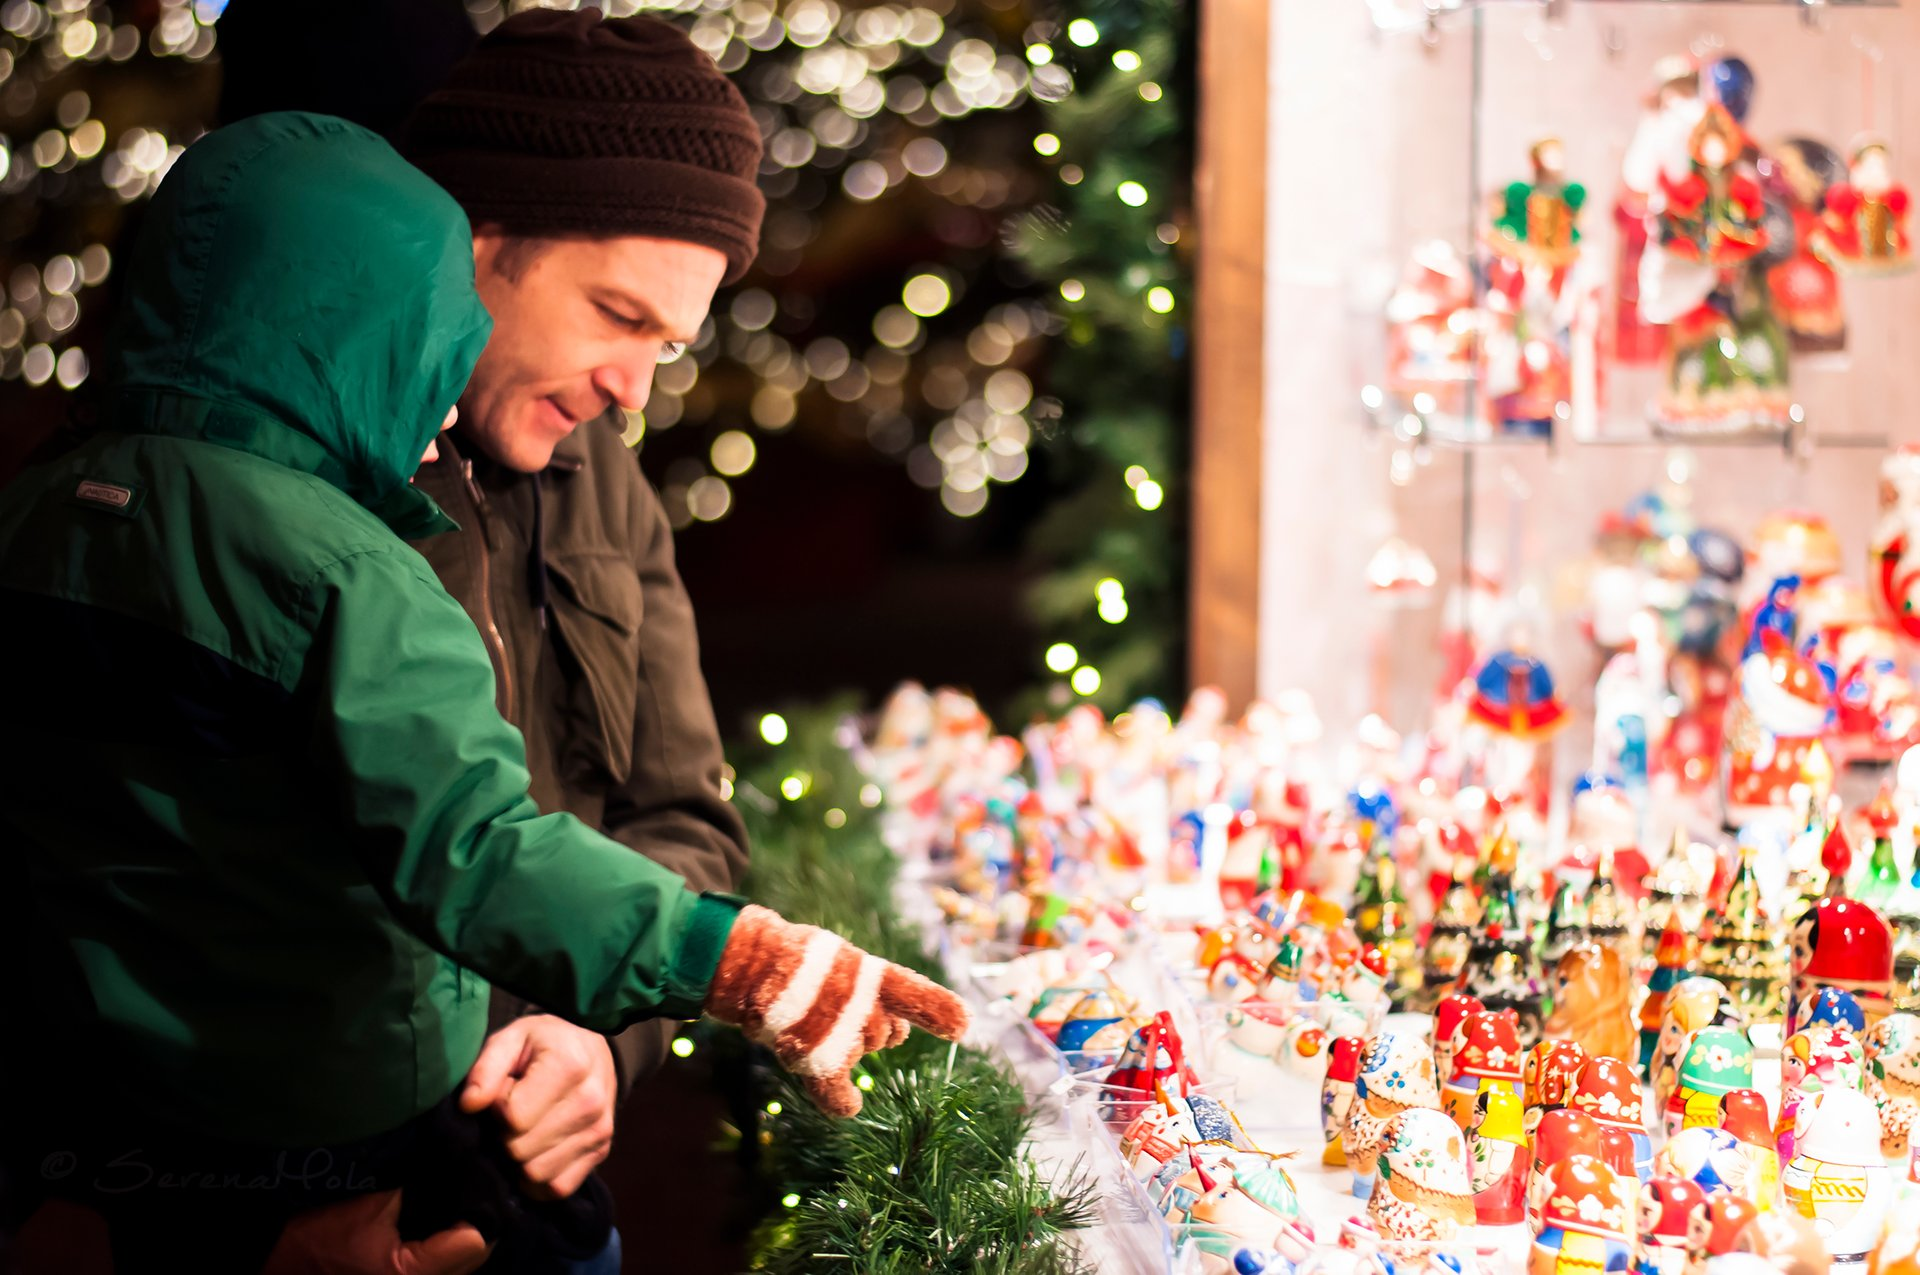 Christmas Events Toronto 2021 Toronto Christmas Market 2021 Dates